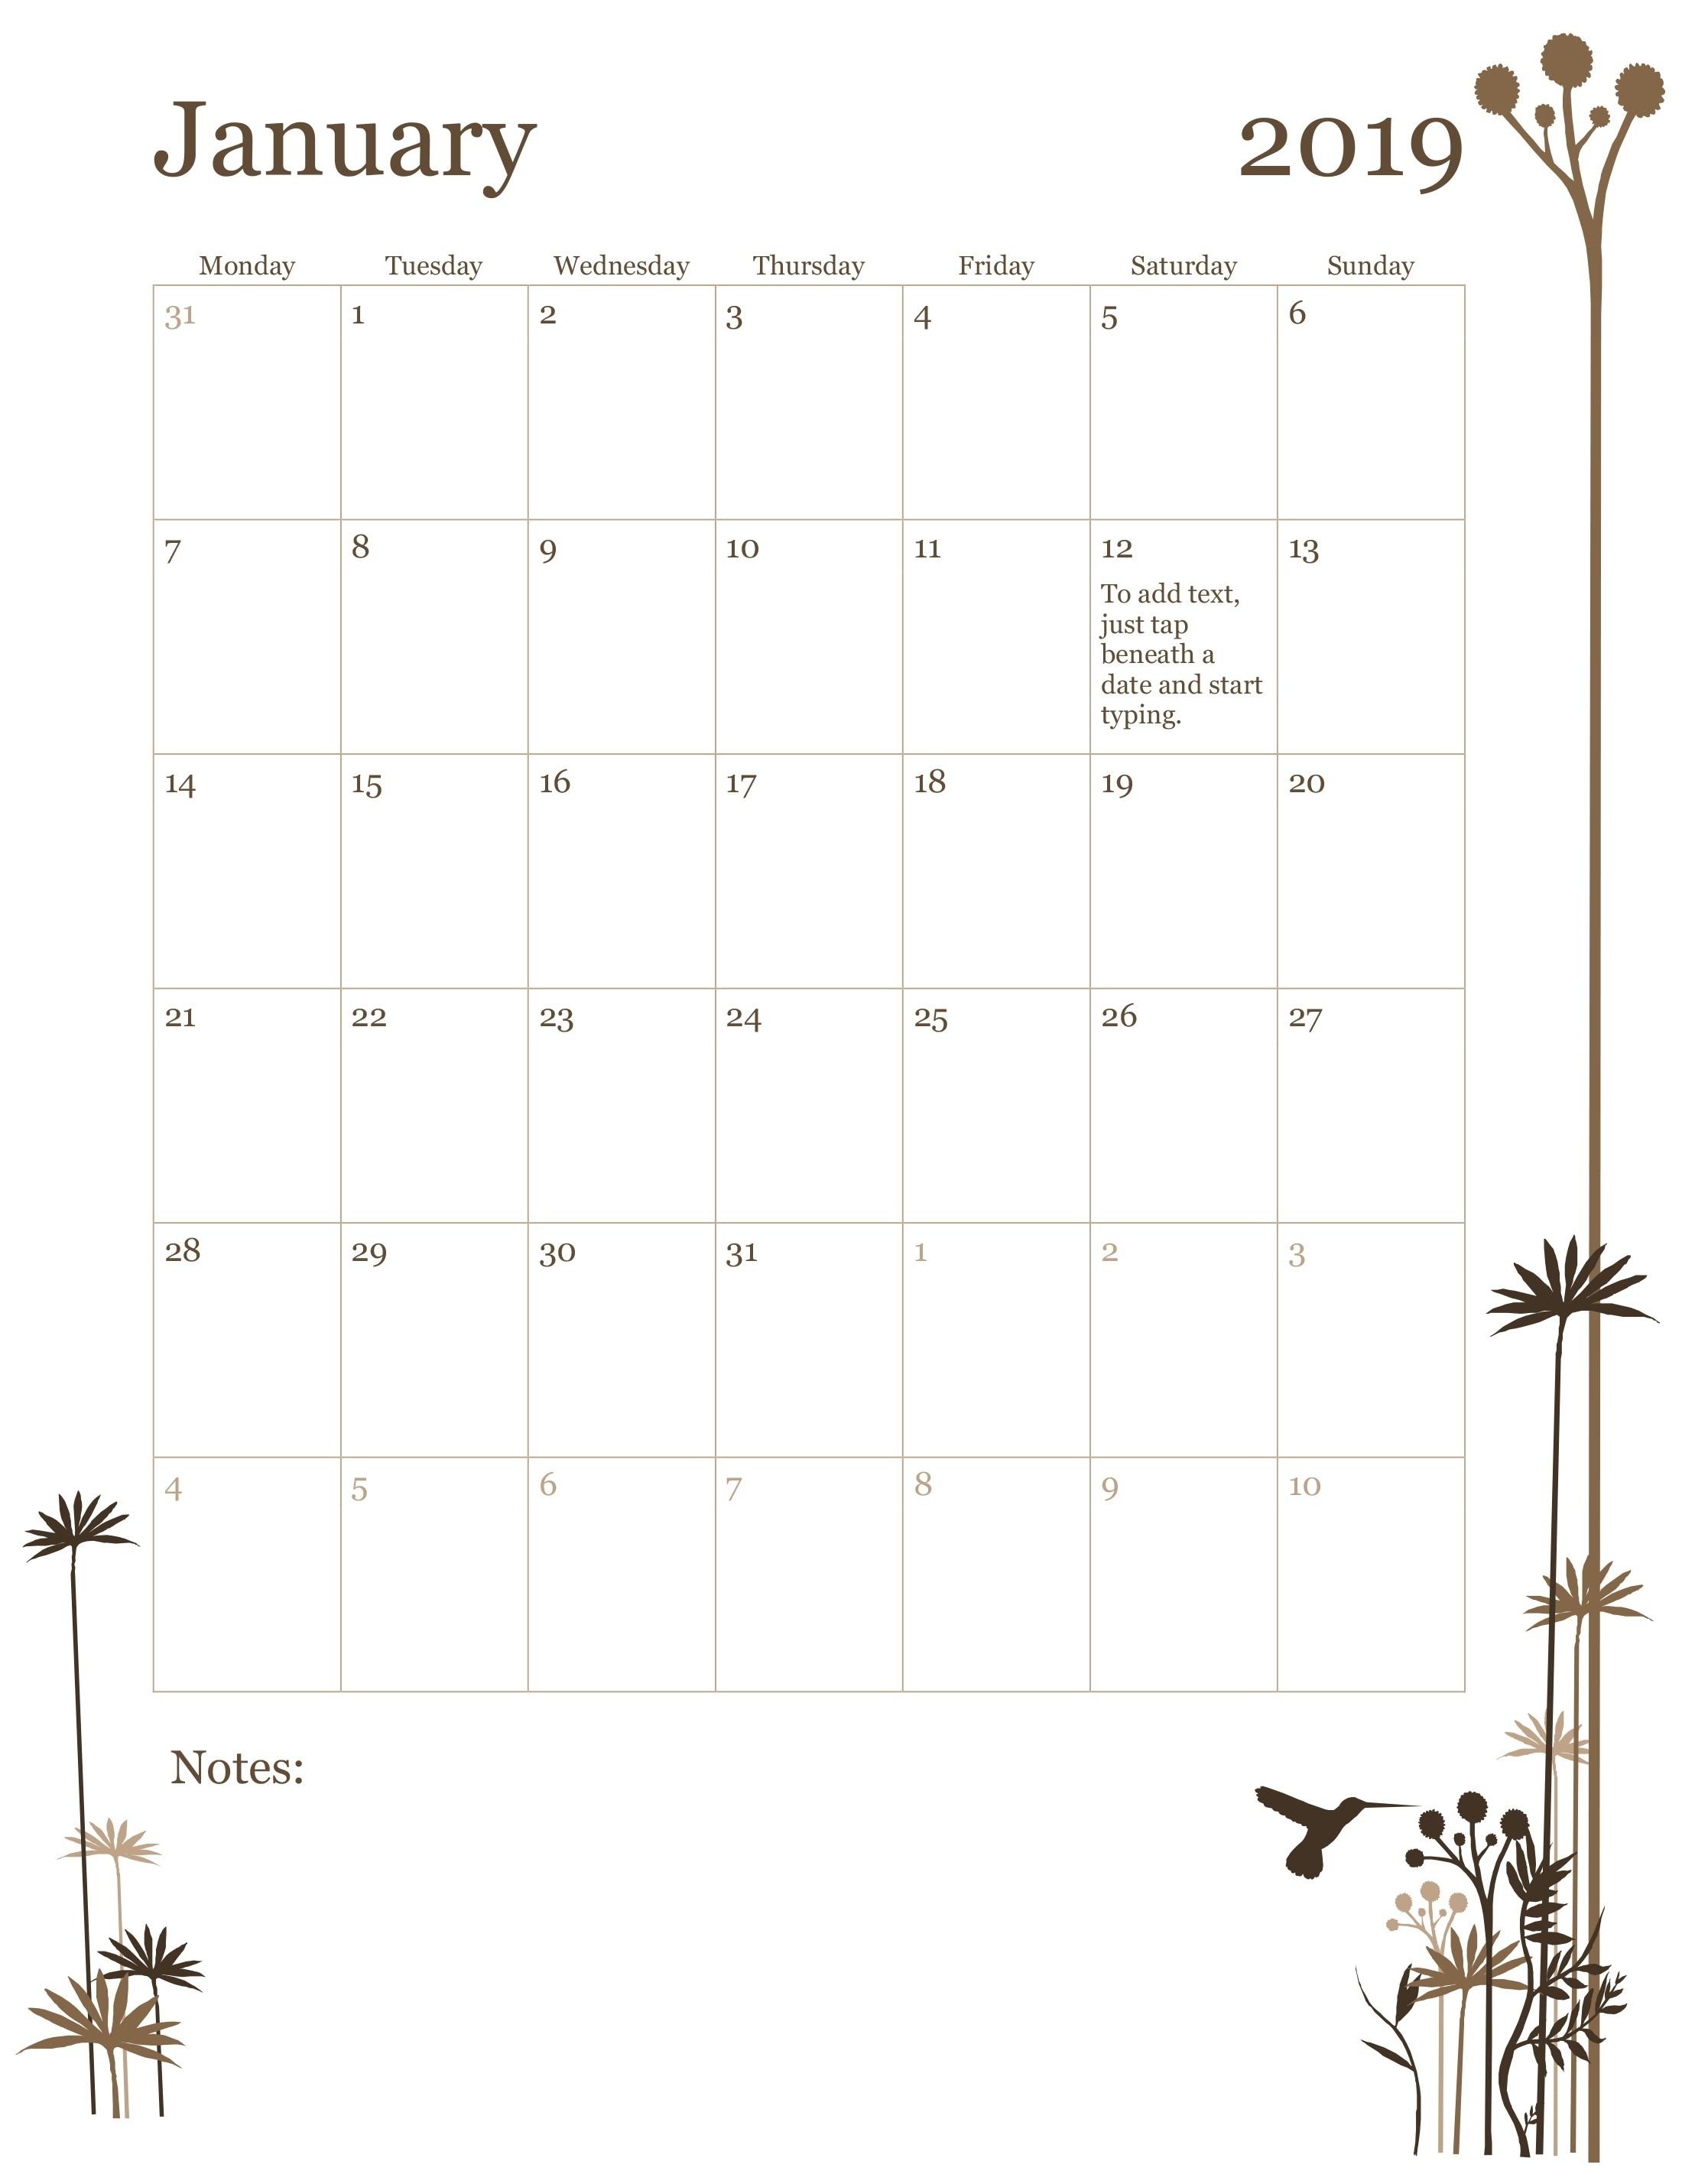 2019 12-Month Calendar (Mon-Sun) regarding Blank 12 Month Seasonal Calendar